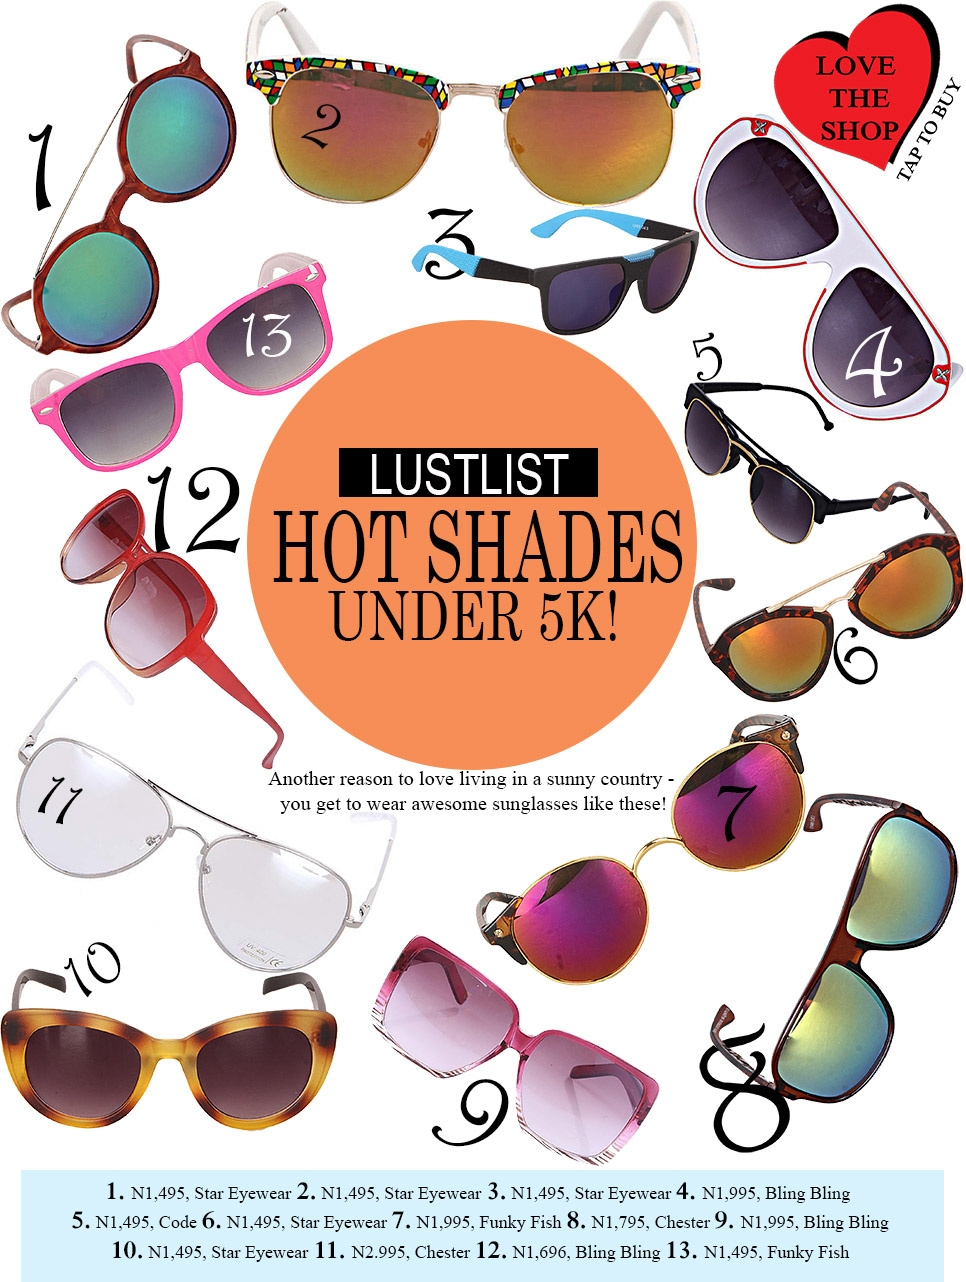 style online magazine